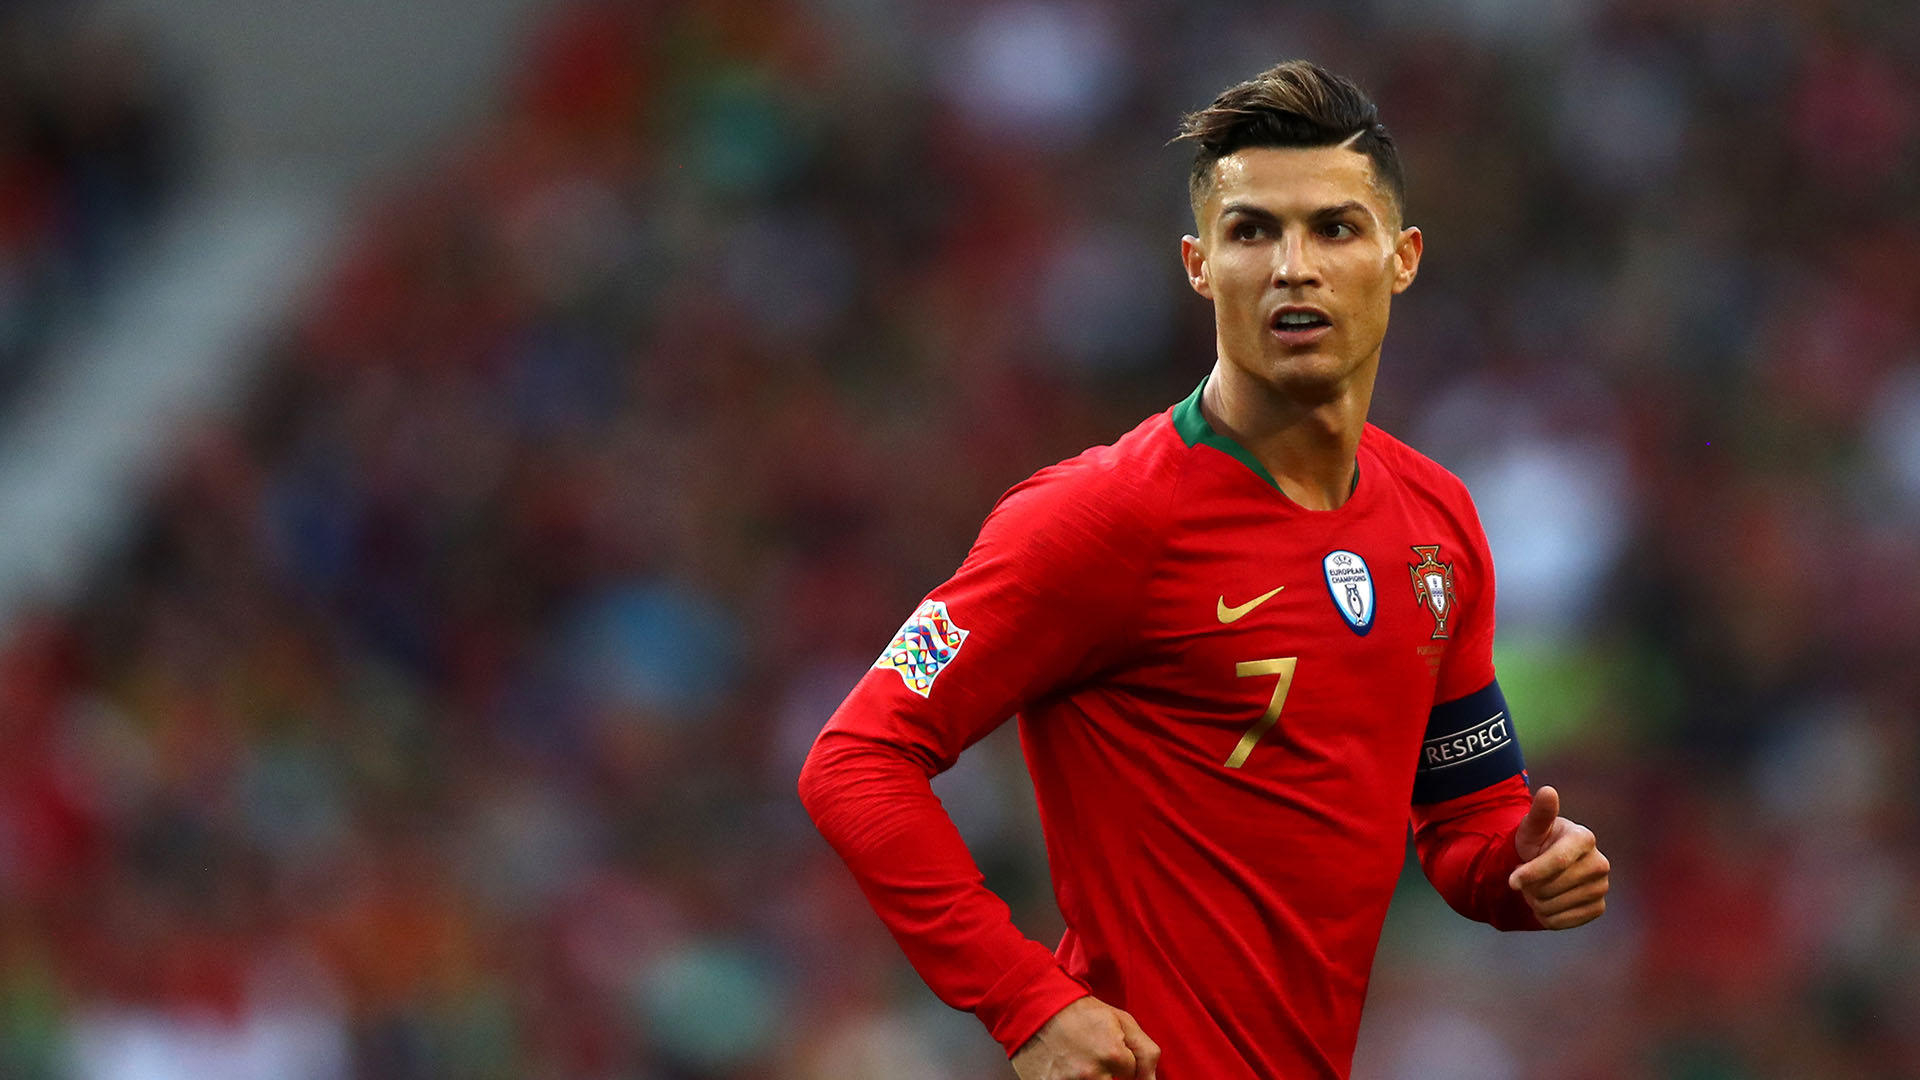 Cristiano Ronaldo | Football Players Wiki